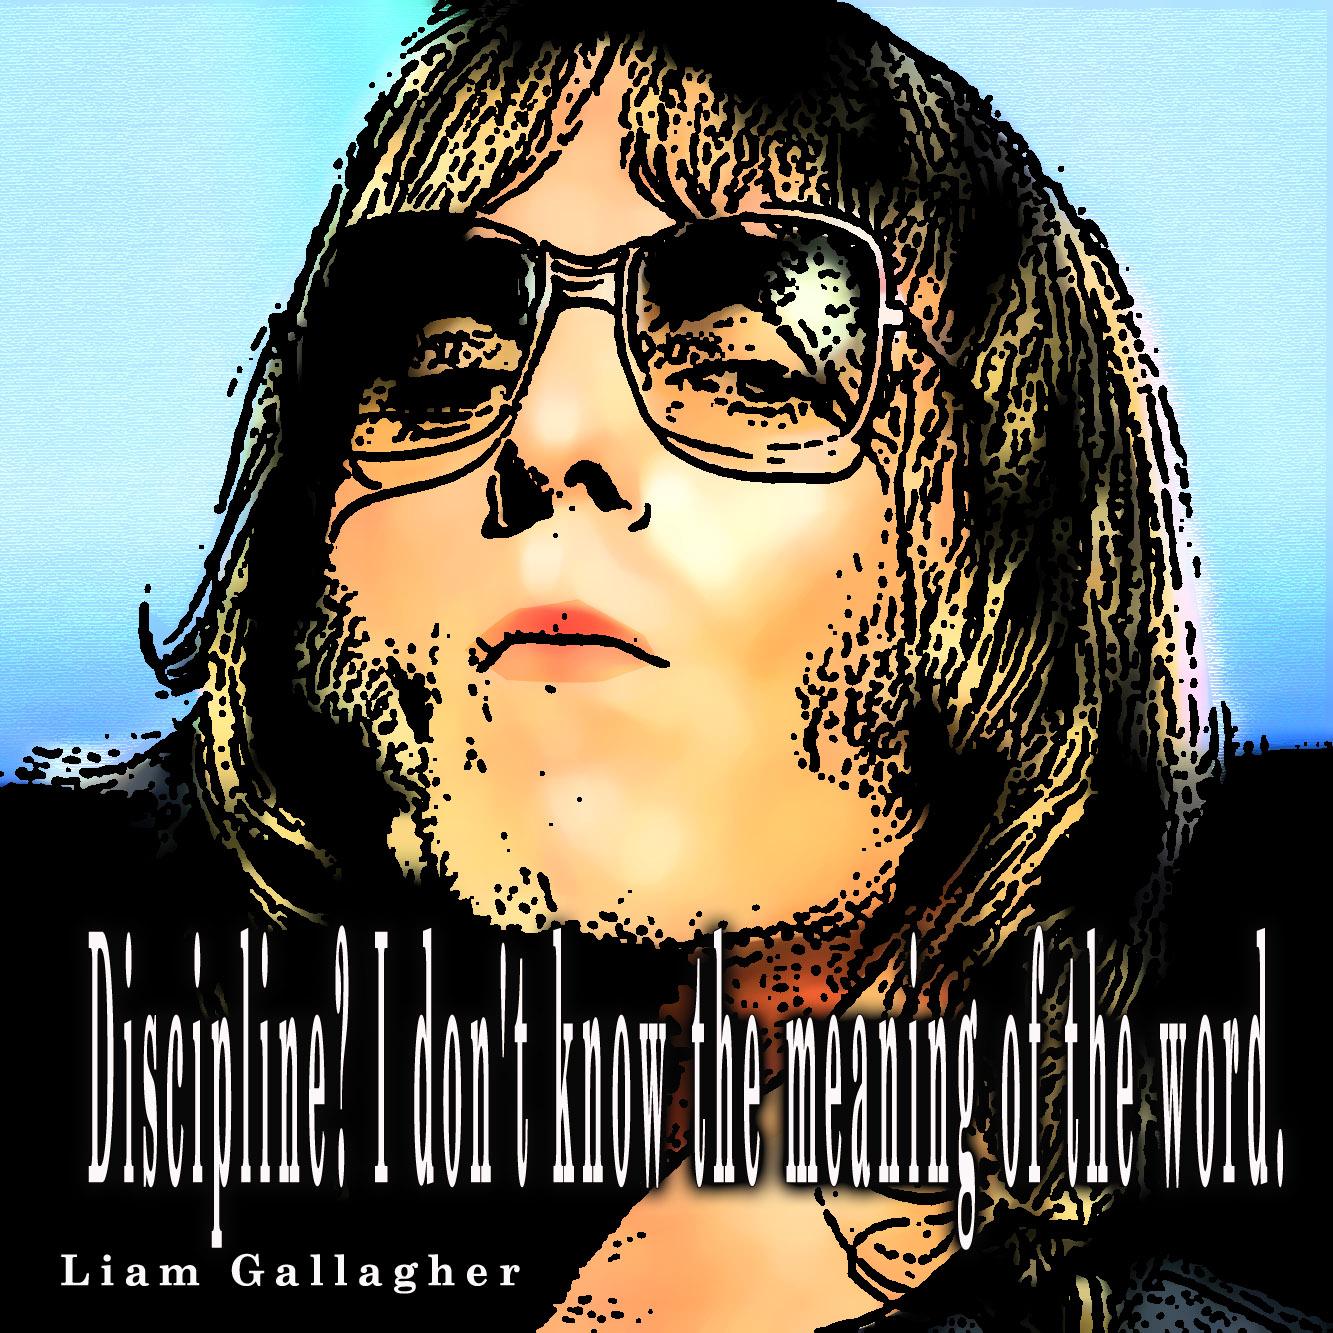 Liam Gallagher's quote #8